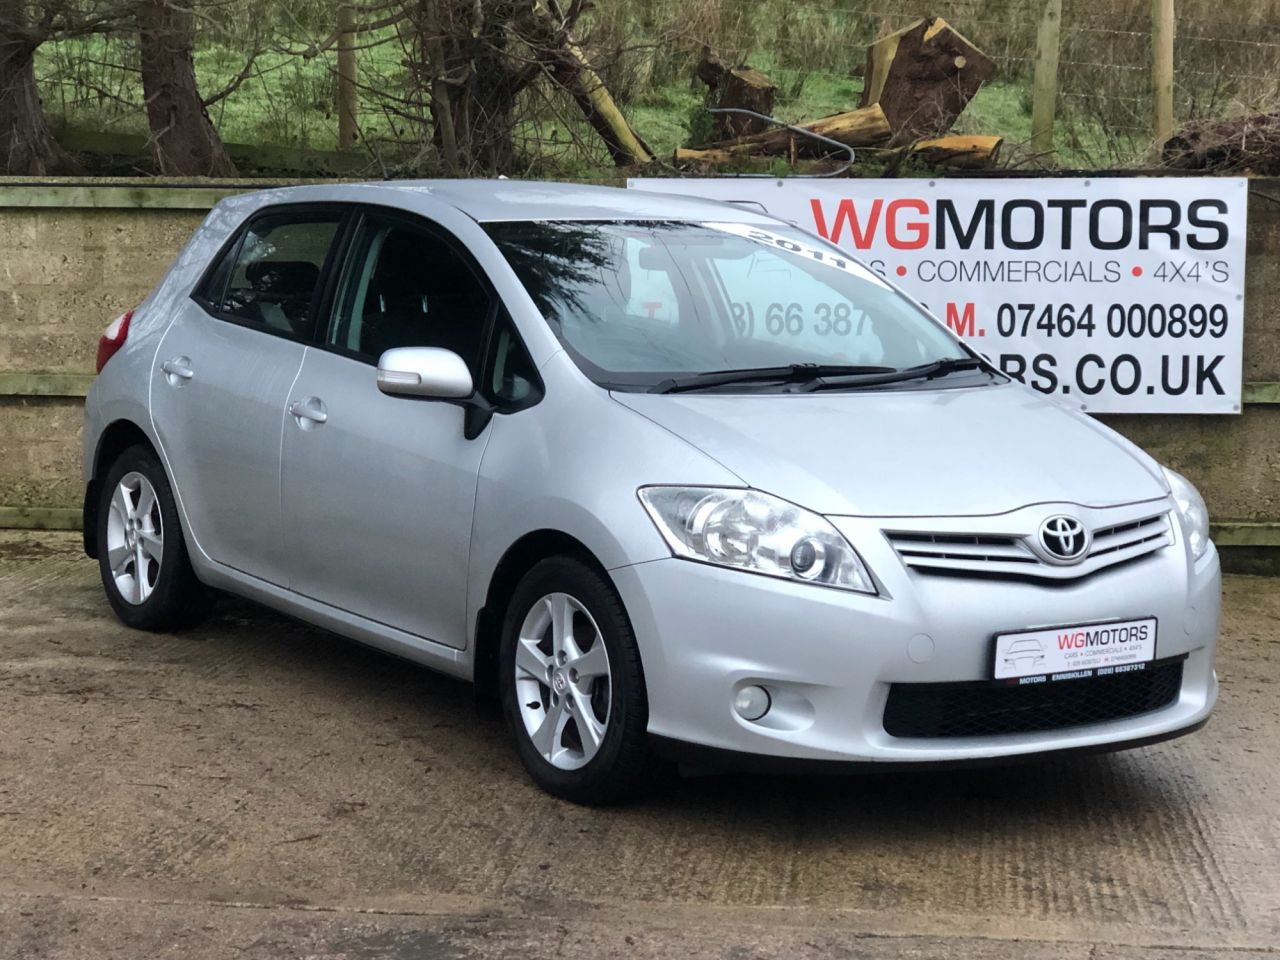 2011 Toyota Auris TR D-4d £4,650